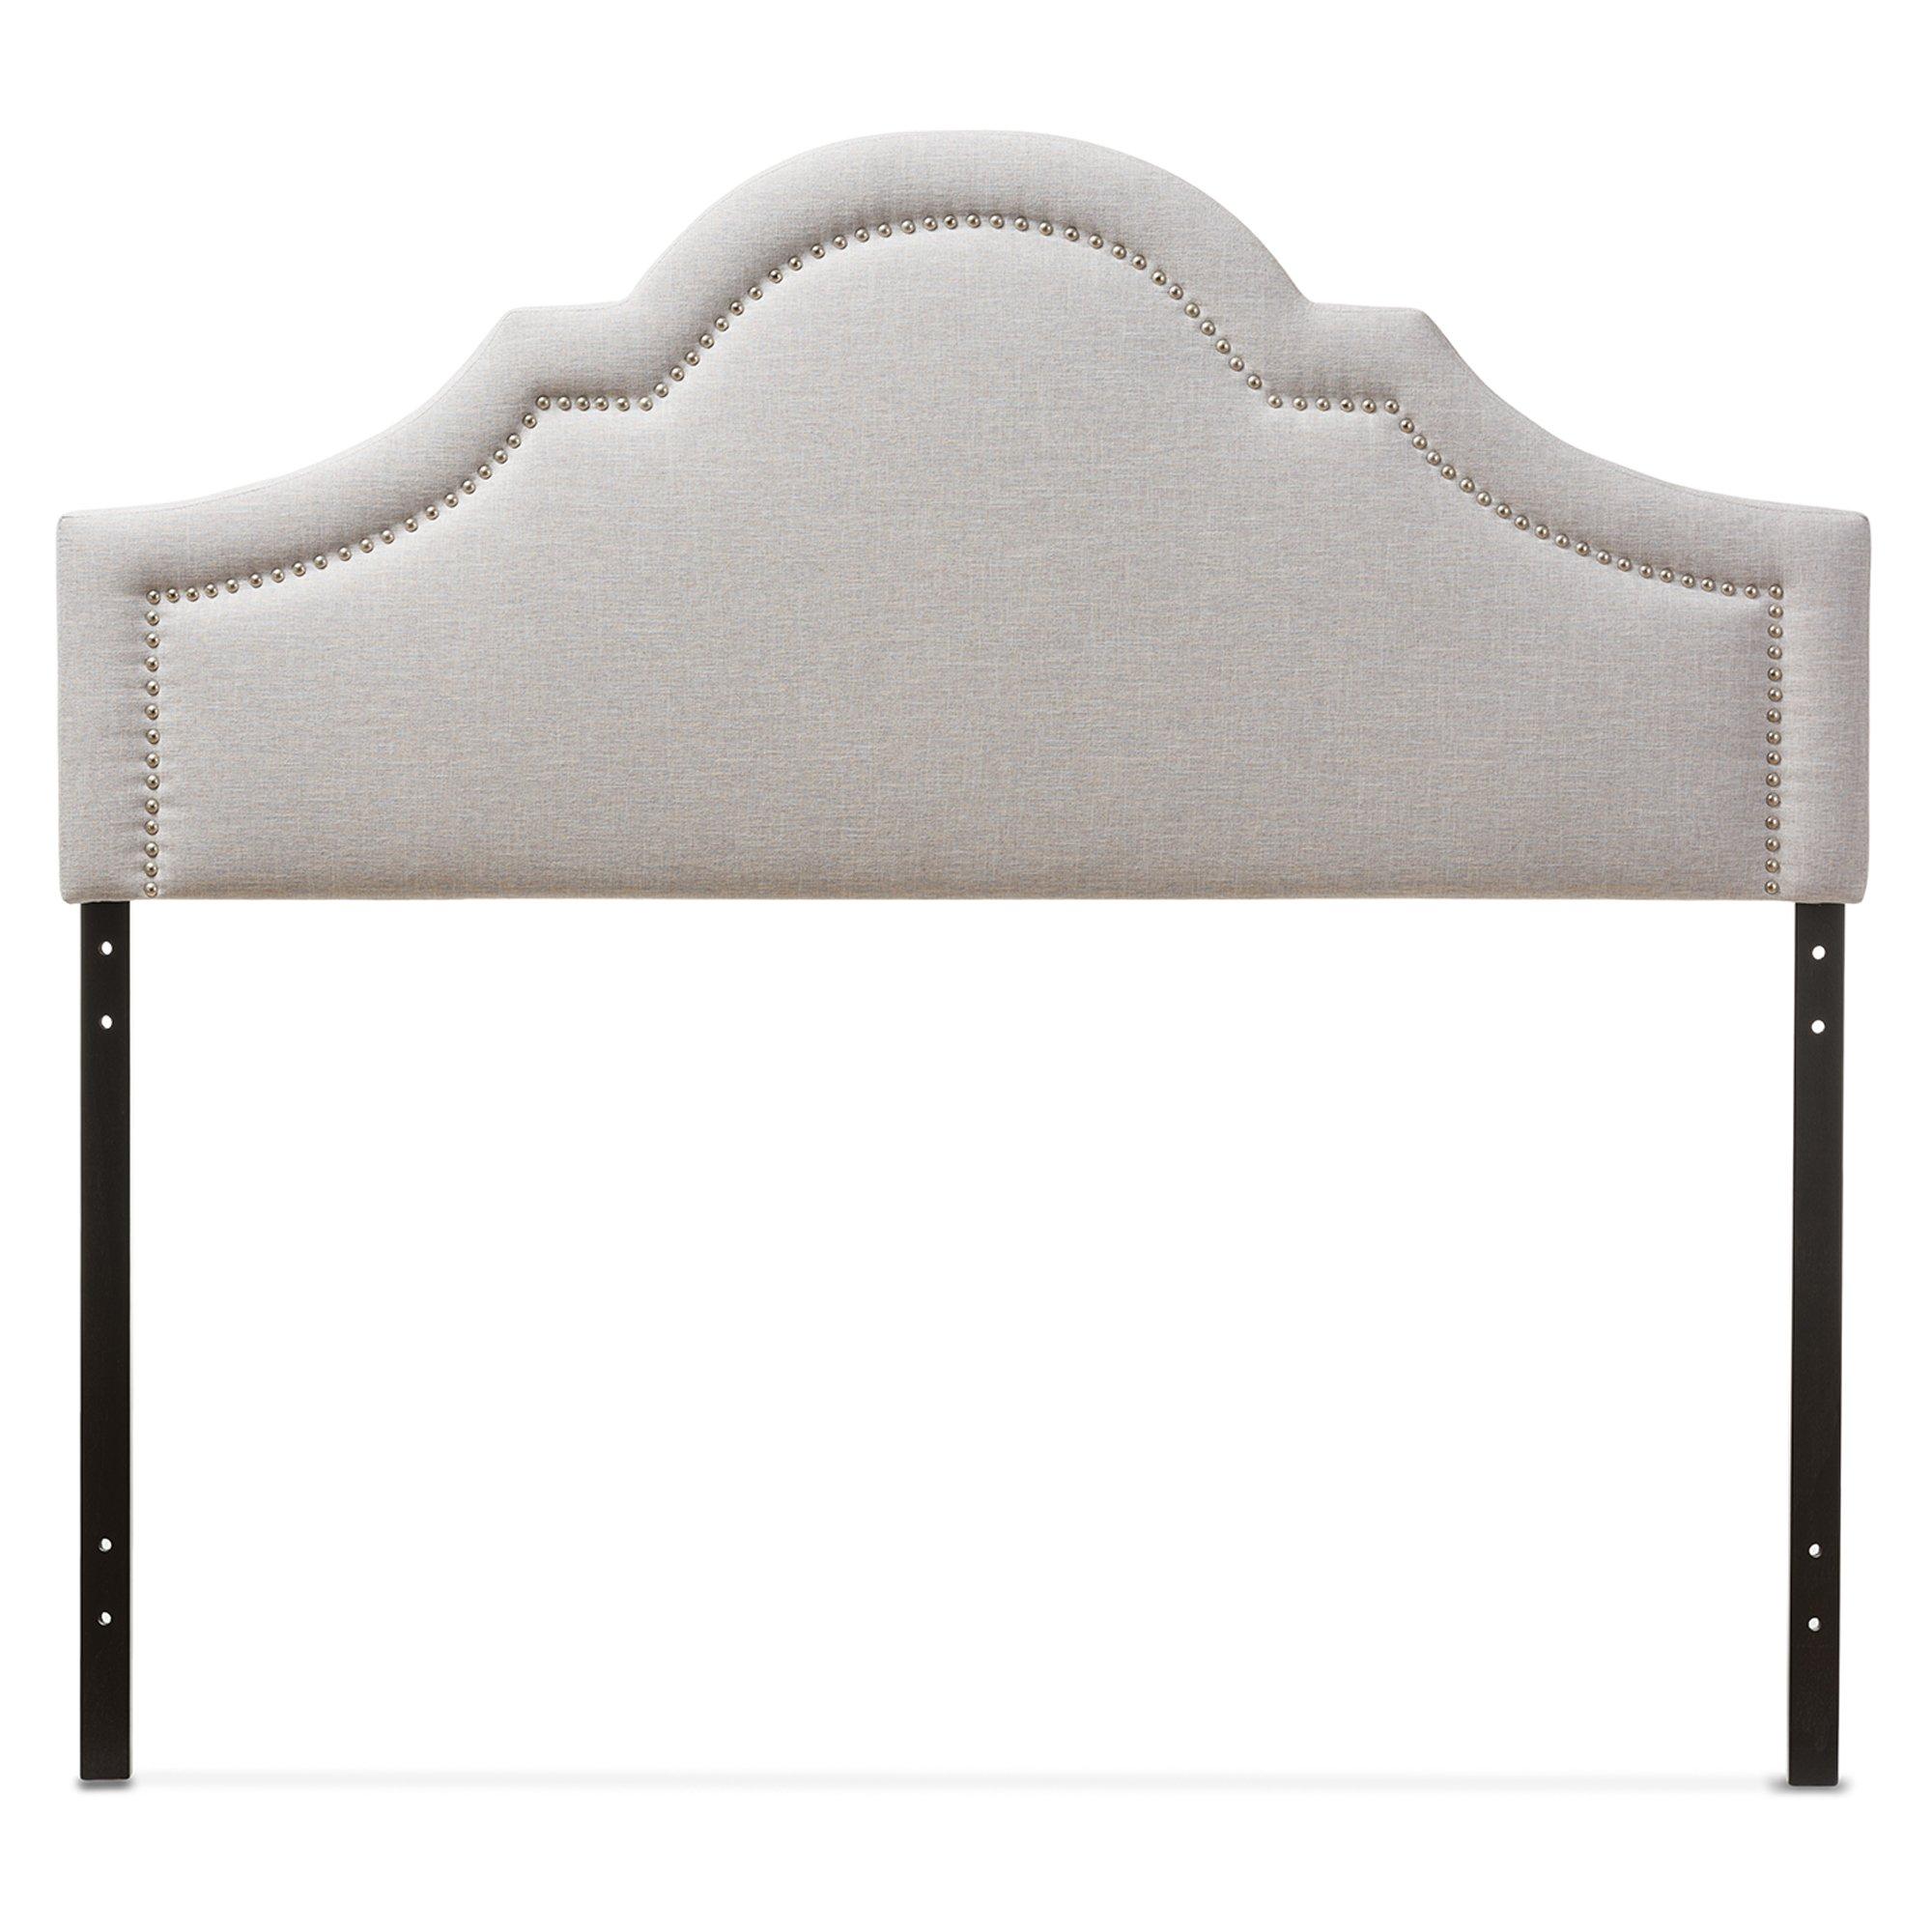 Baxton Studio Jardan Modern & Contemporary Fabric Upholstered Headboard, Full, Greyish Beige